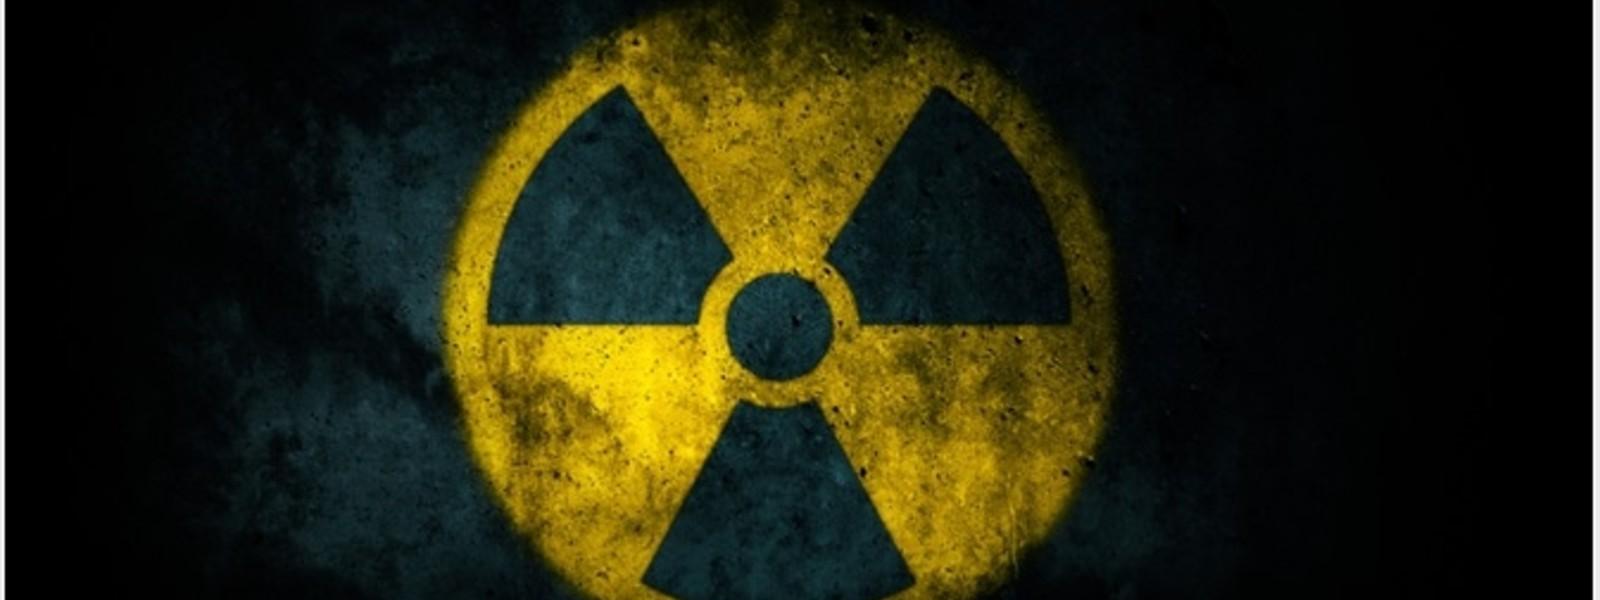 BREAKING: Ship to China with Radioactive material docks at H'tota Port in Sri Lanka